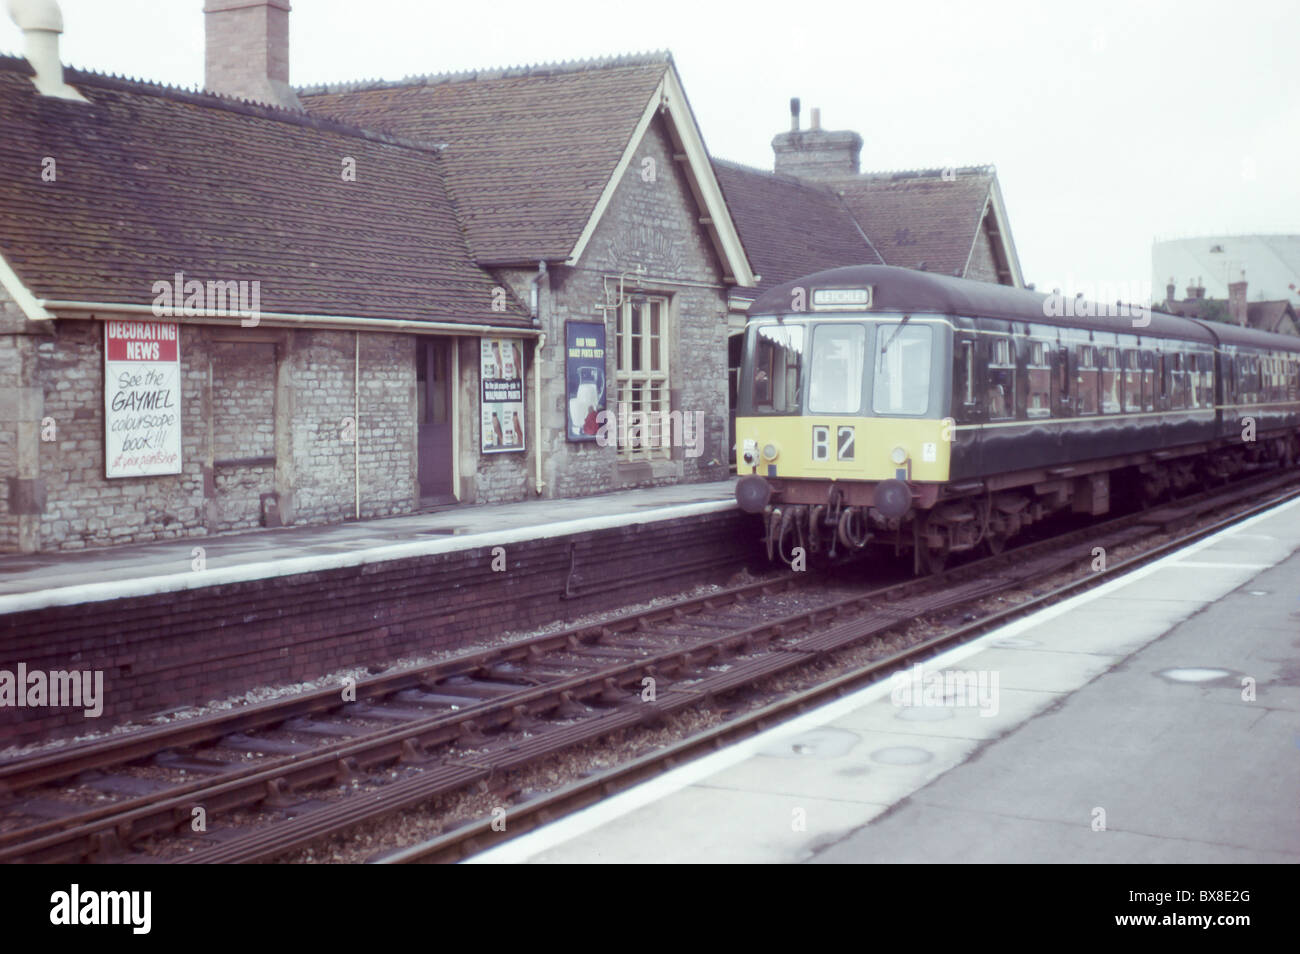 british railway 1960s stock photos british railway 1960s. Black Bedroom Furniture Sets. Home Design Ideas